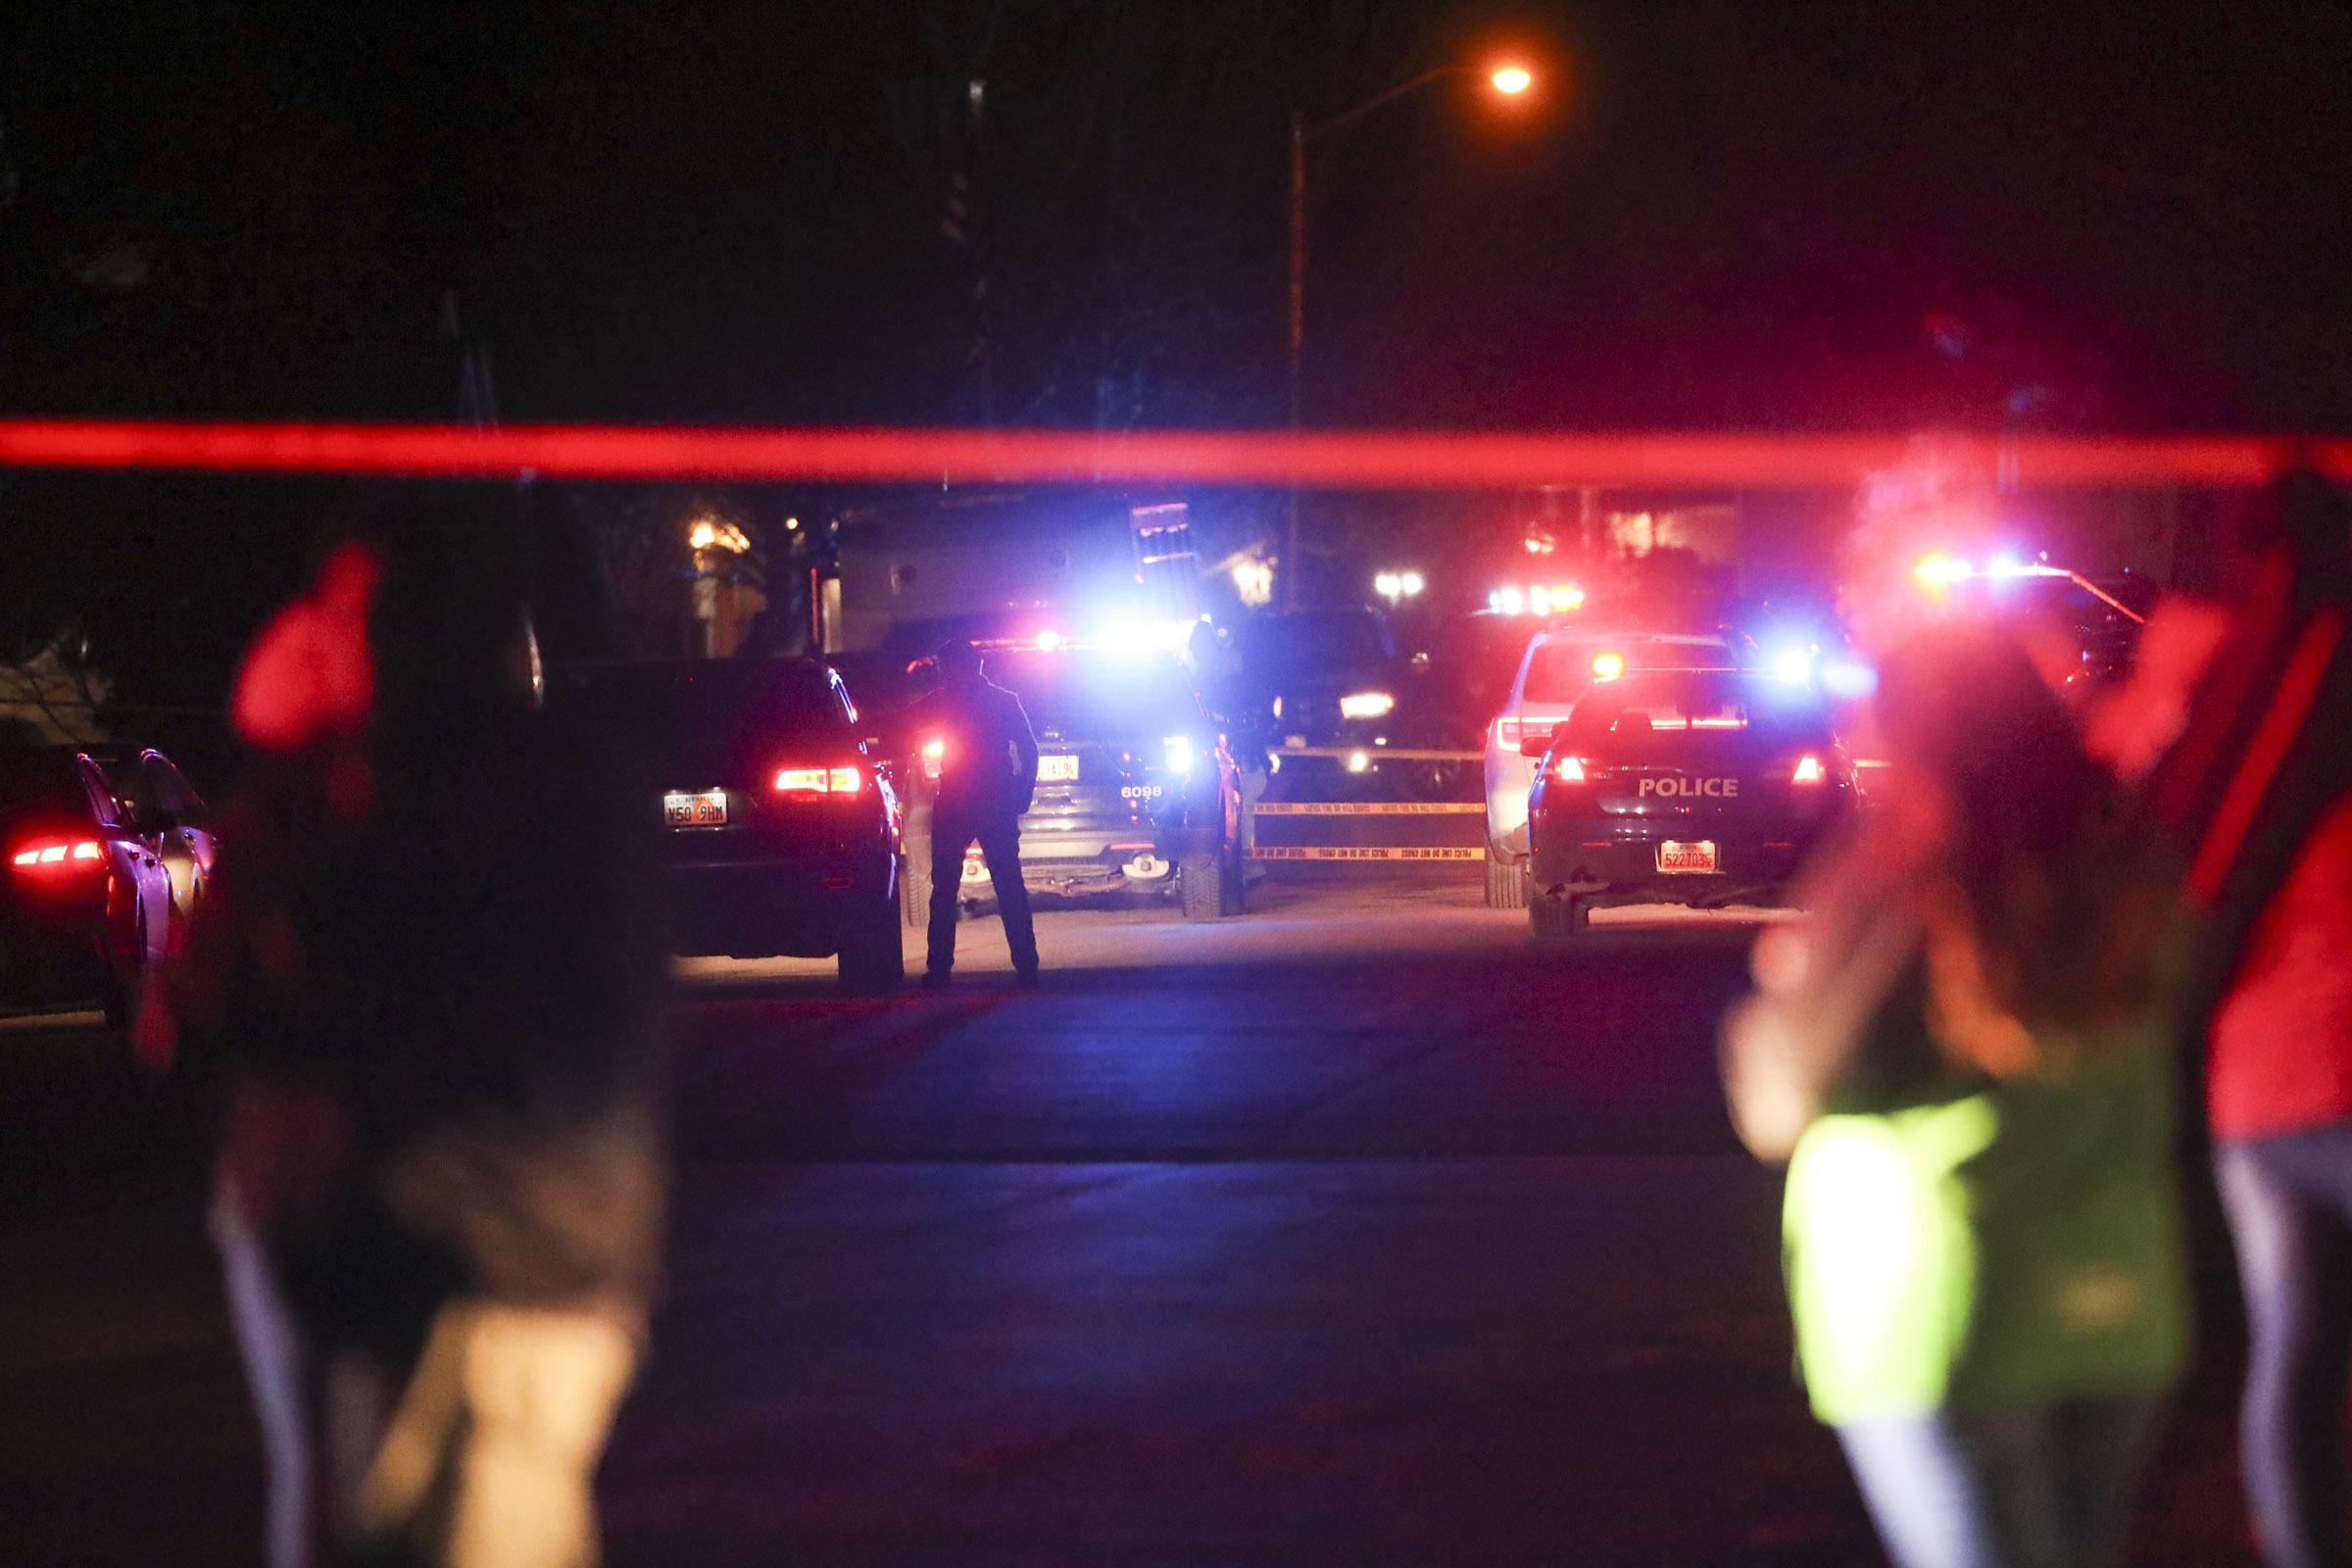 4 Killed, 1 Injured in Family Shooting in Salt Lake City Suburb